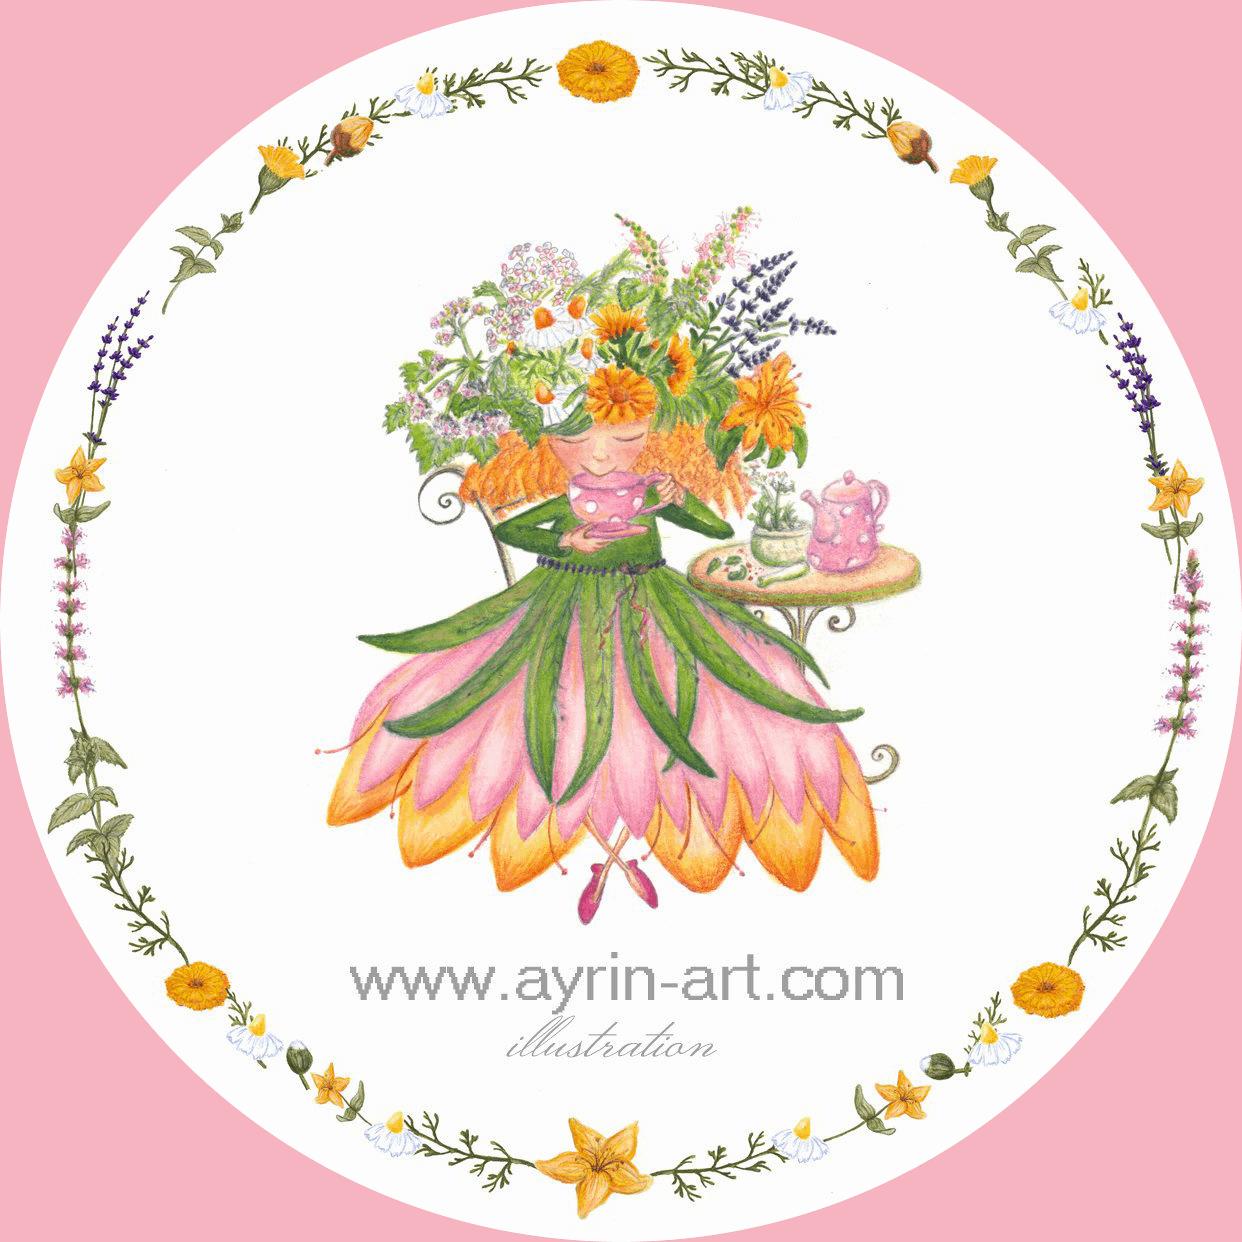 ayrin-art.com